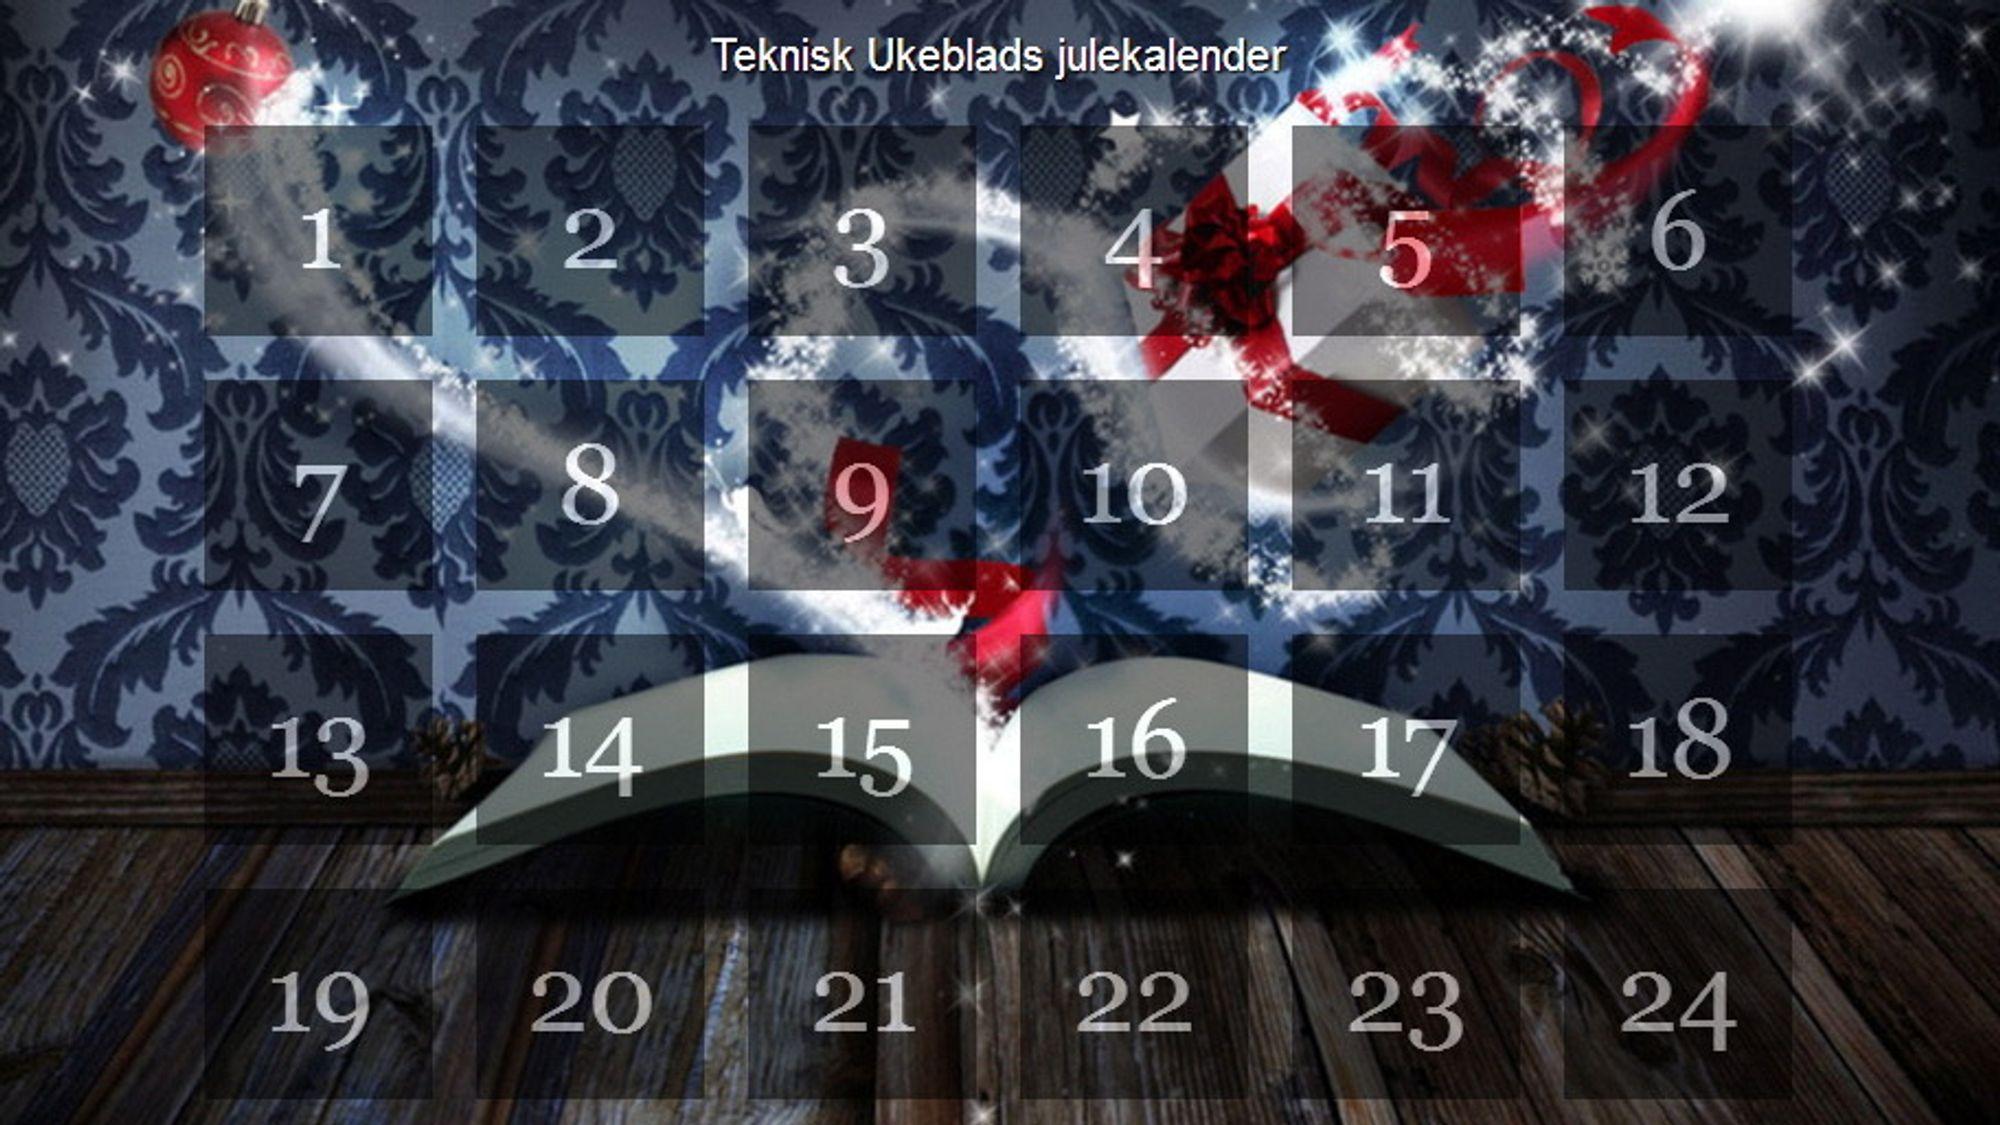 Teknisk Ukeblads julekalender 2013.